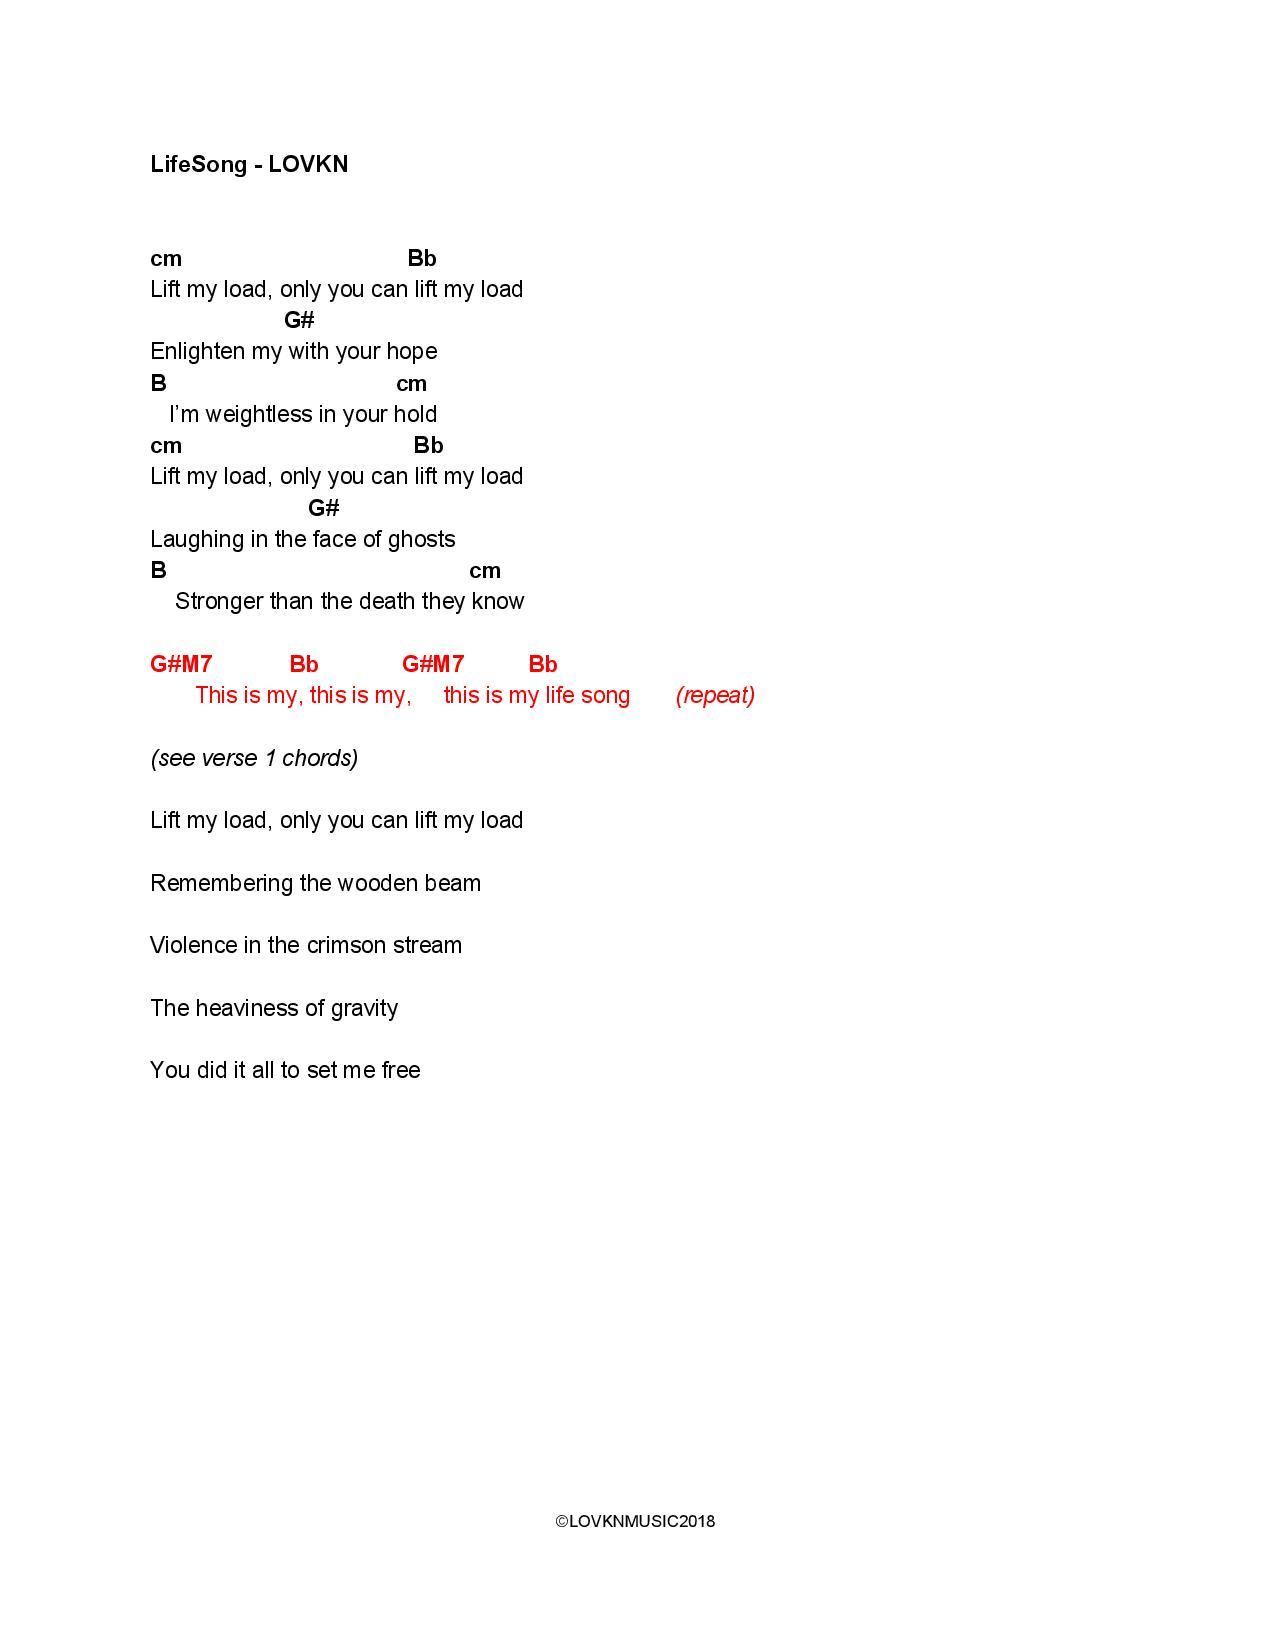 LifeSong-page-001.jpg